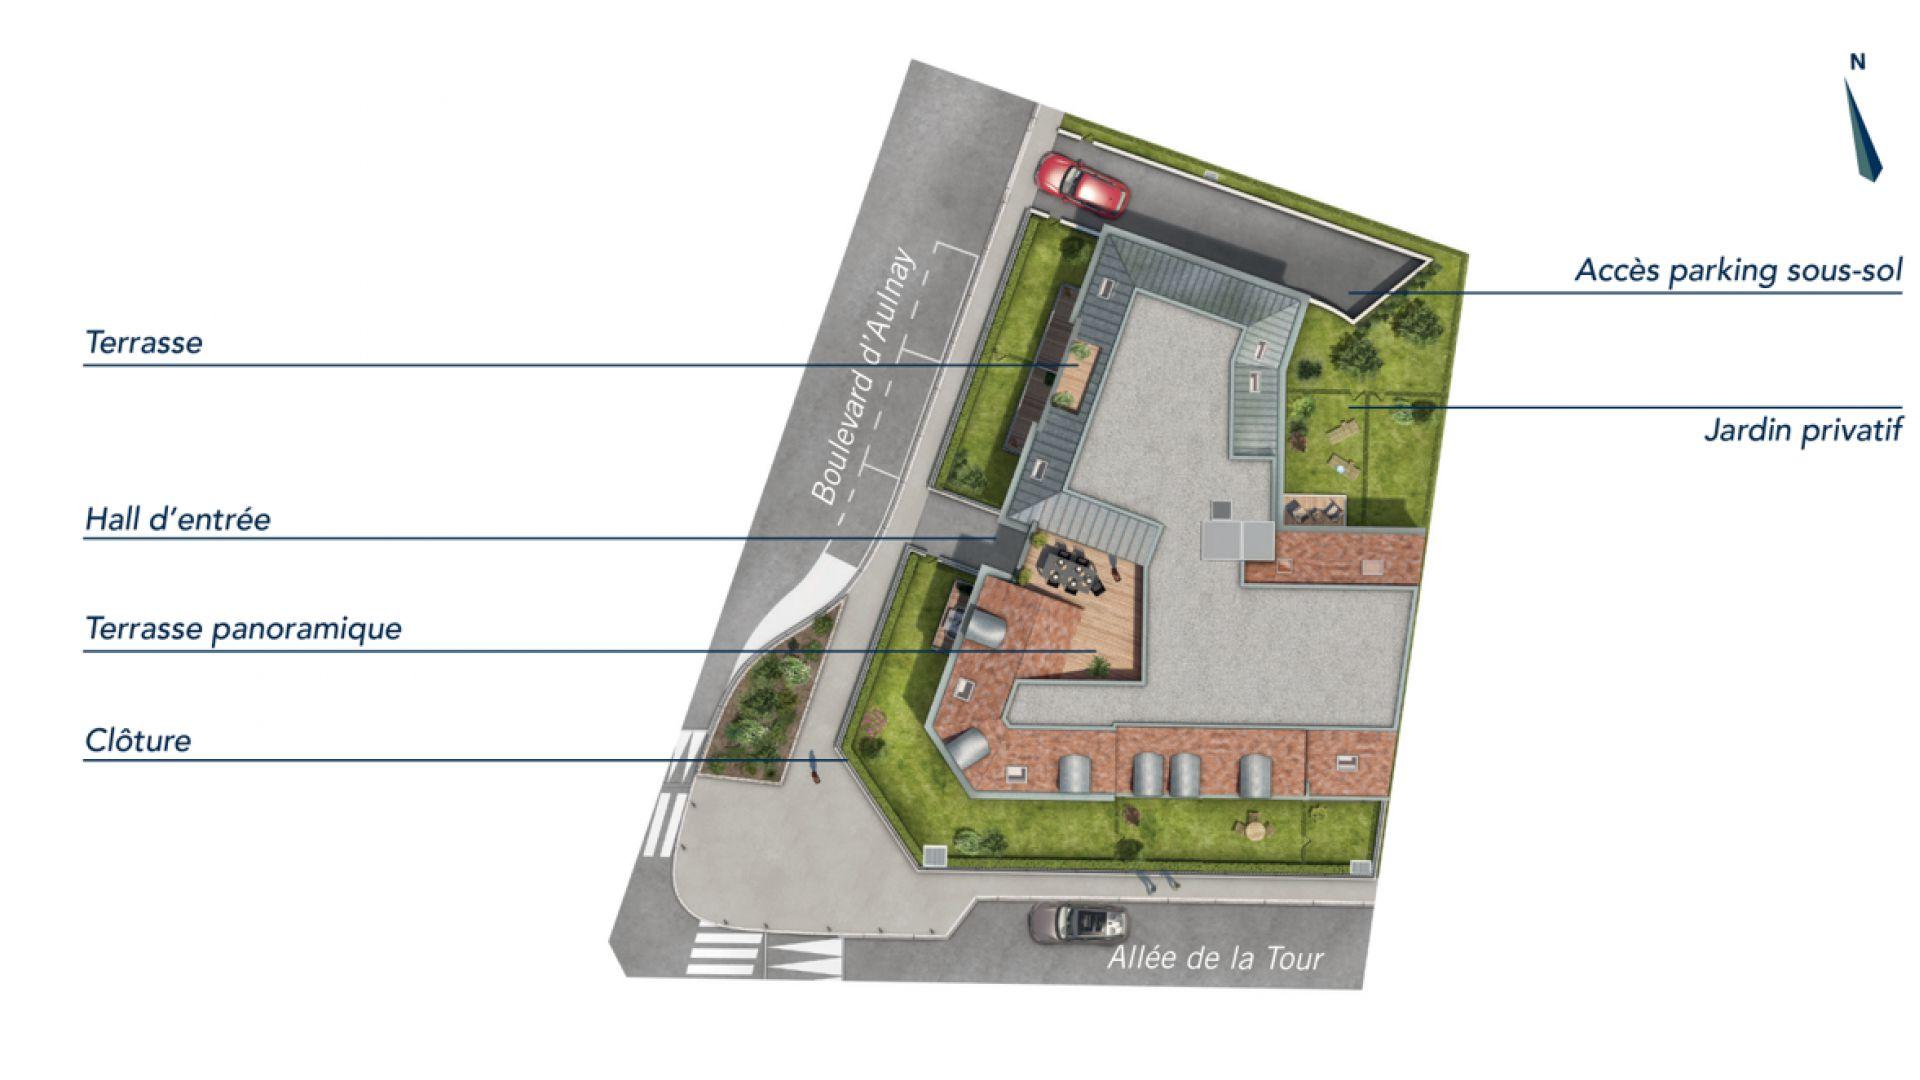 GreenCity immobilier - achat appartement  neuf - Villemomble - 93250 - Villa Castille - plan de masse